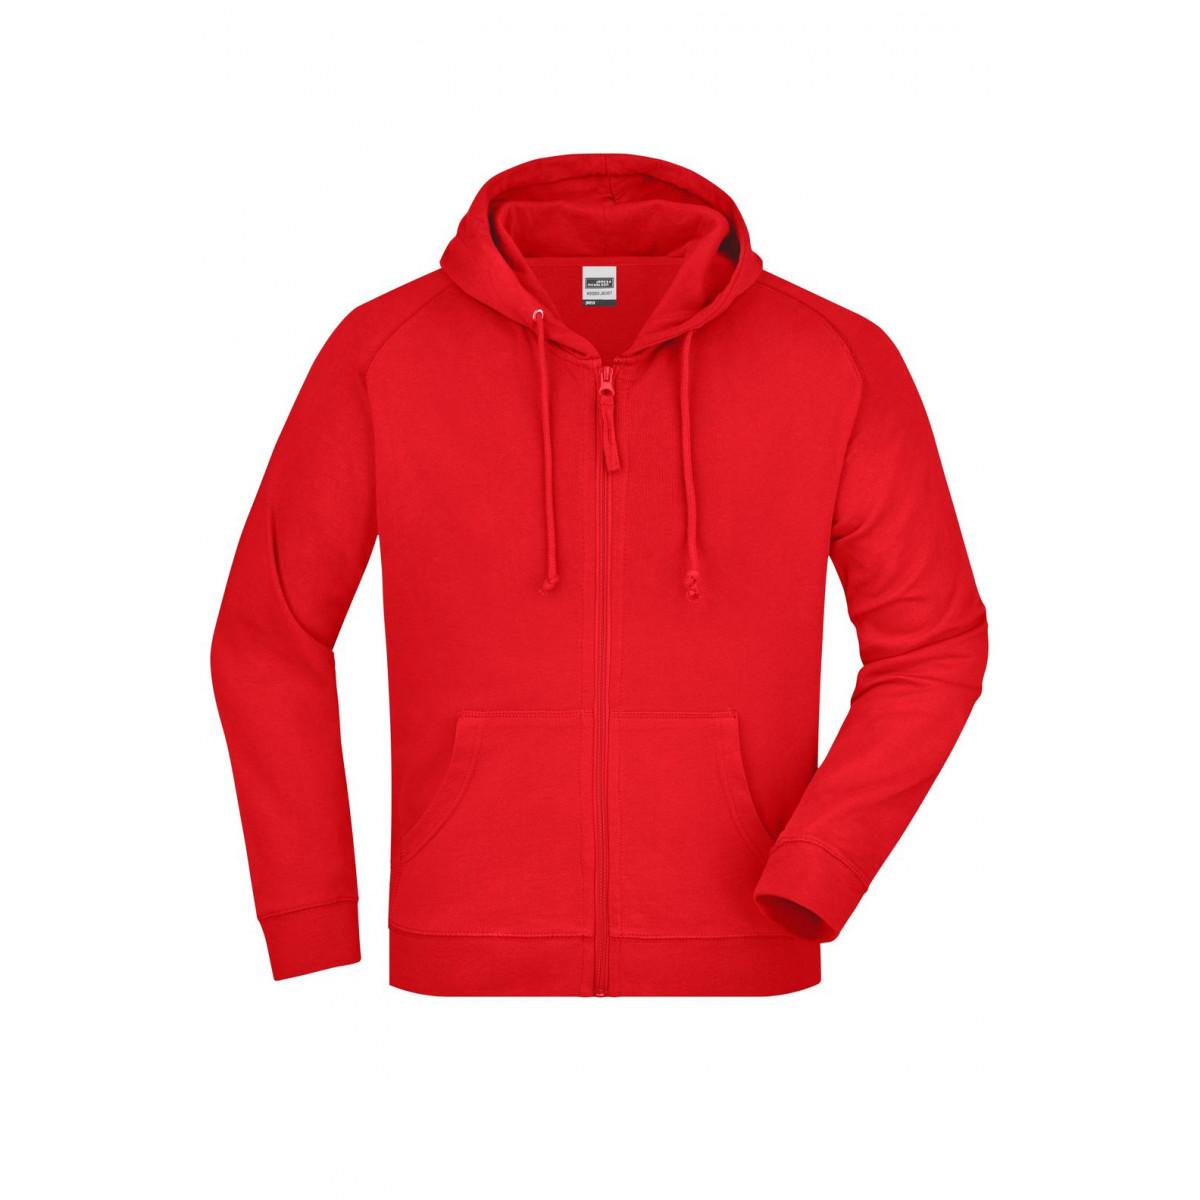 Толстовка мужская JN059 Hooded Jacket - Красный